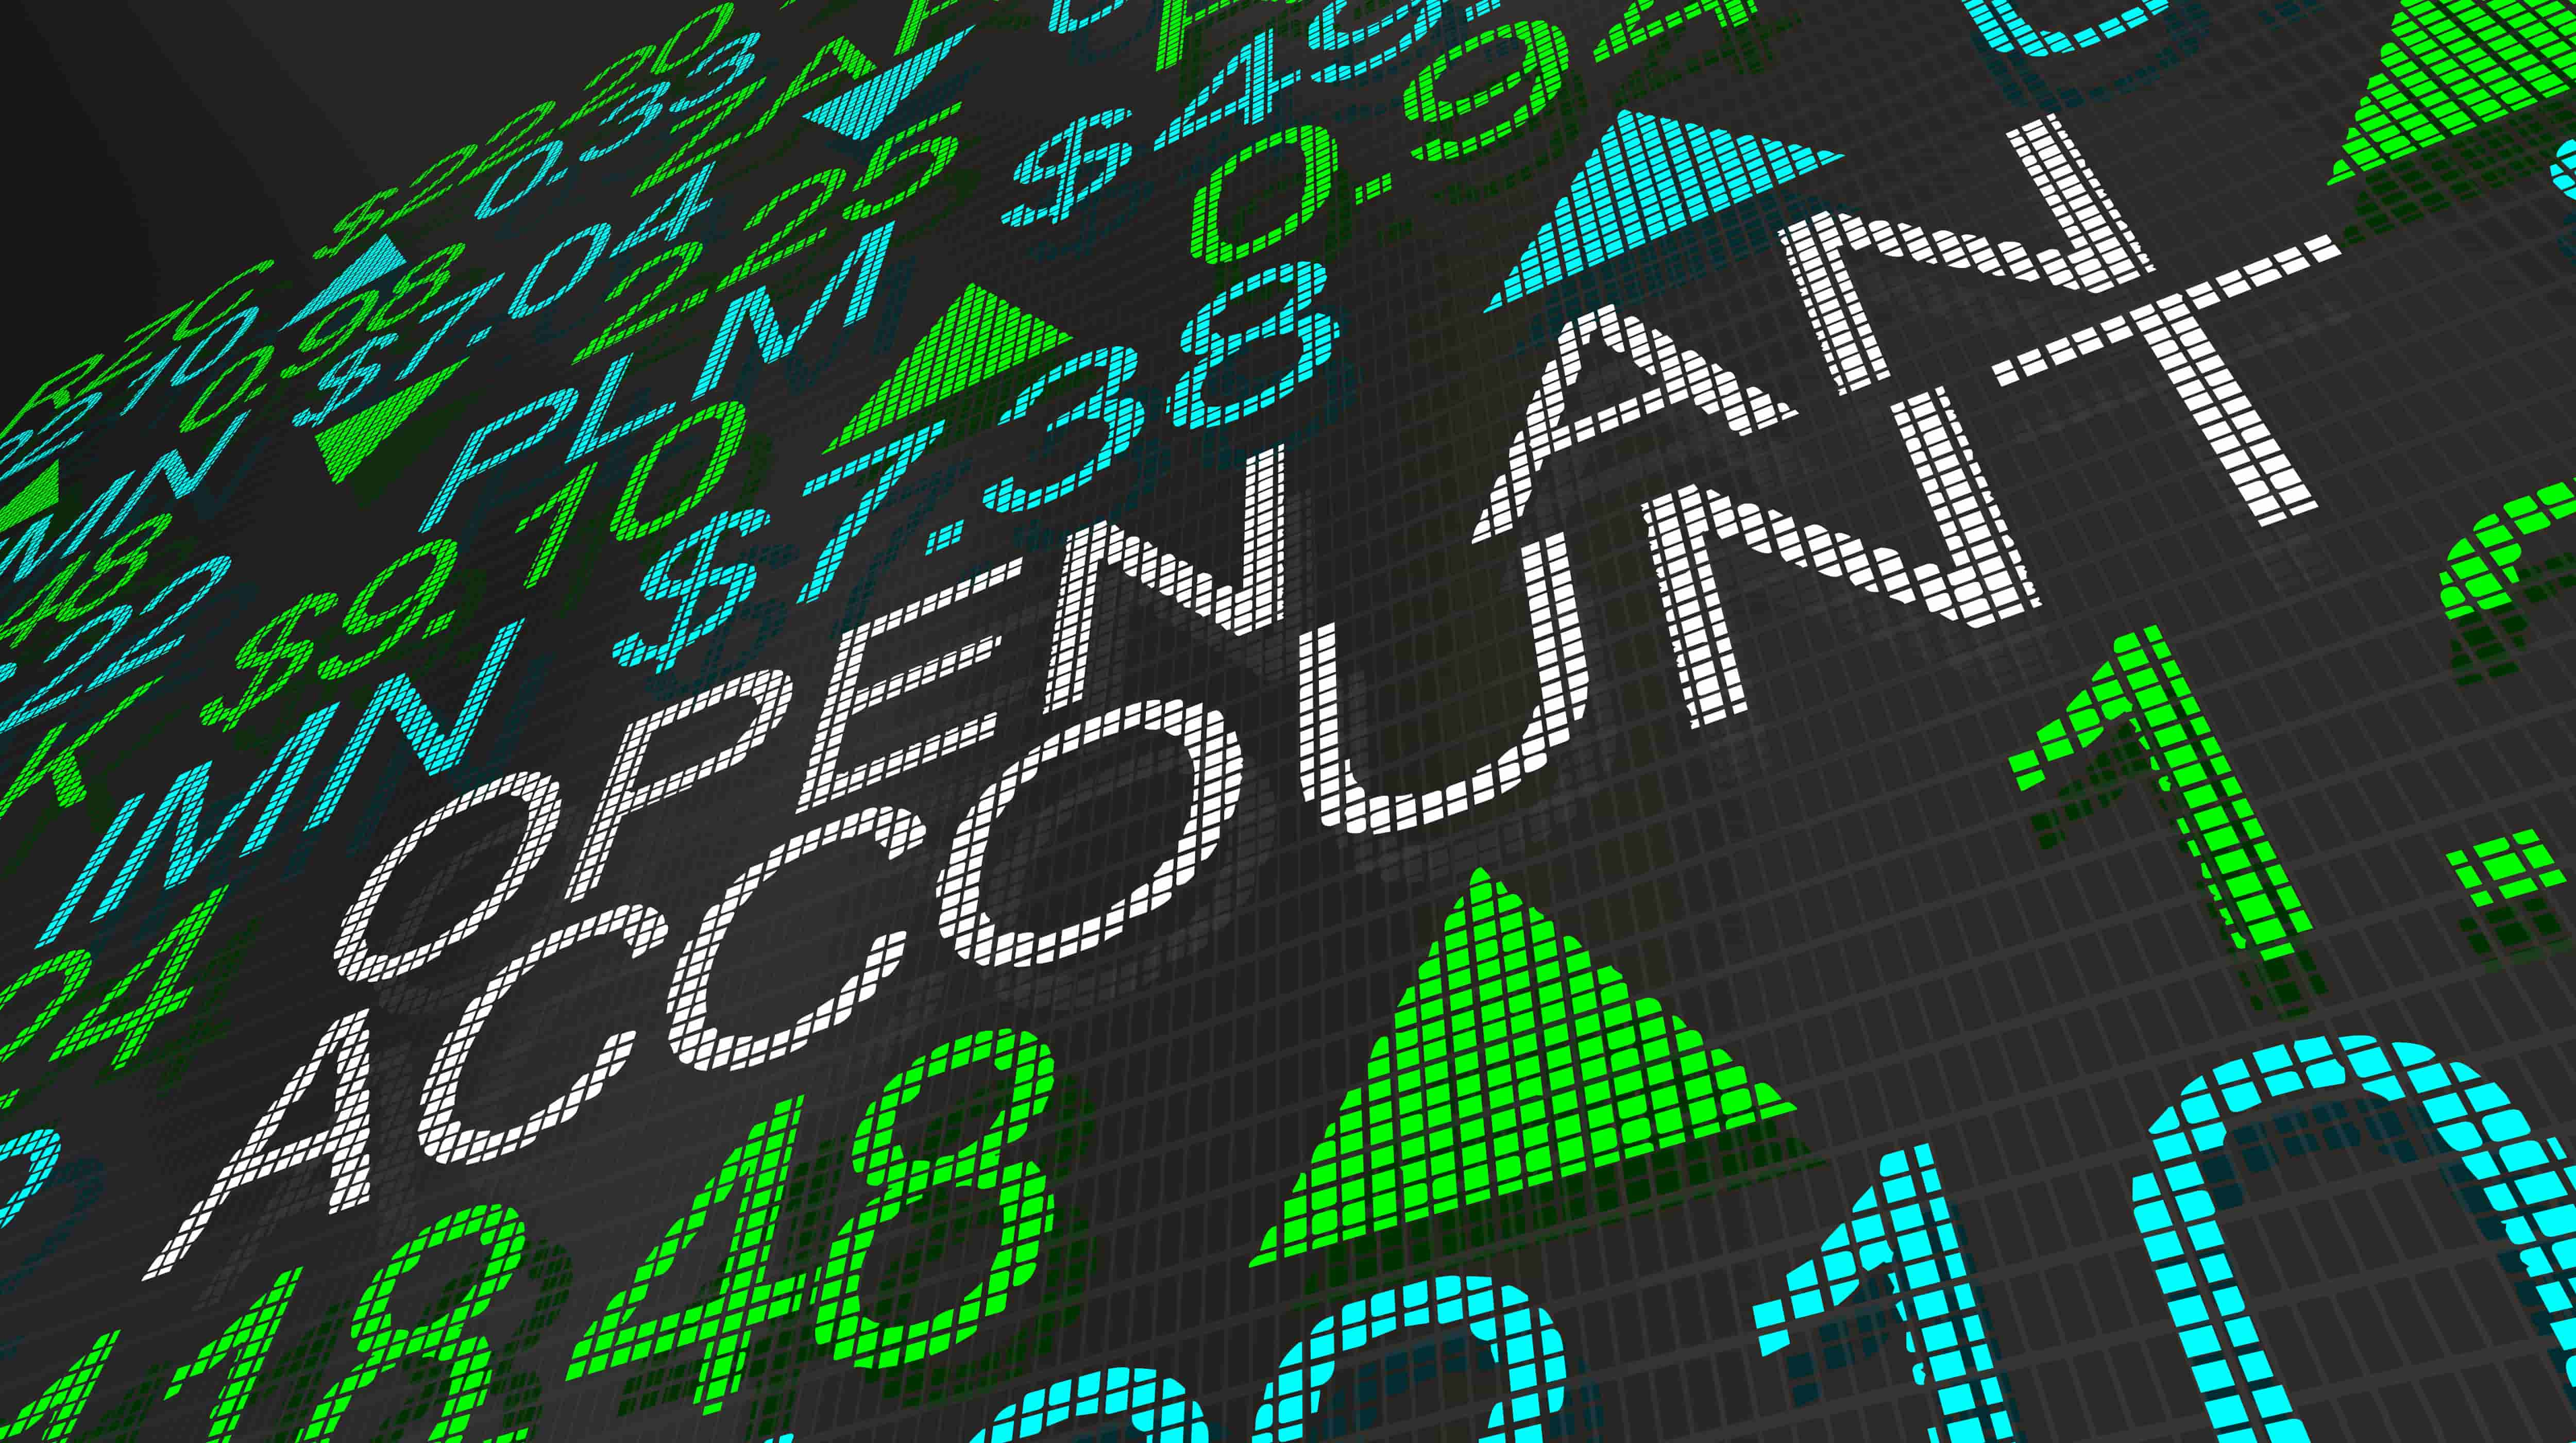 open an account text on stock market ticker Illustration